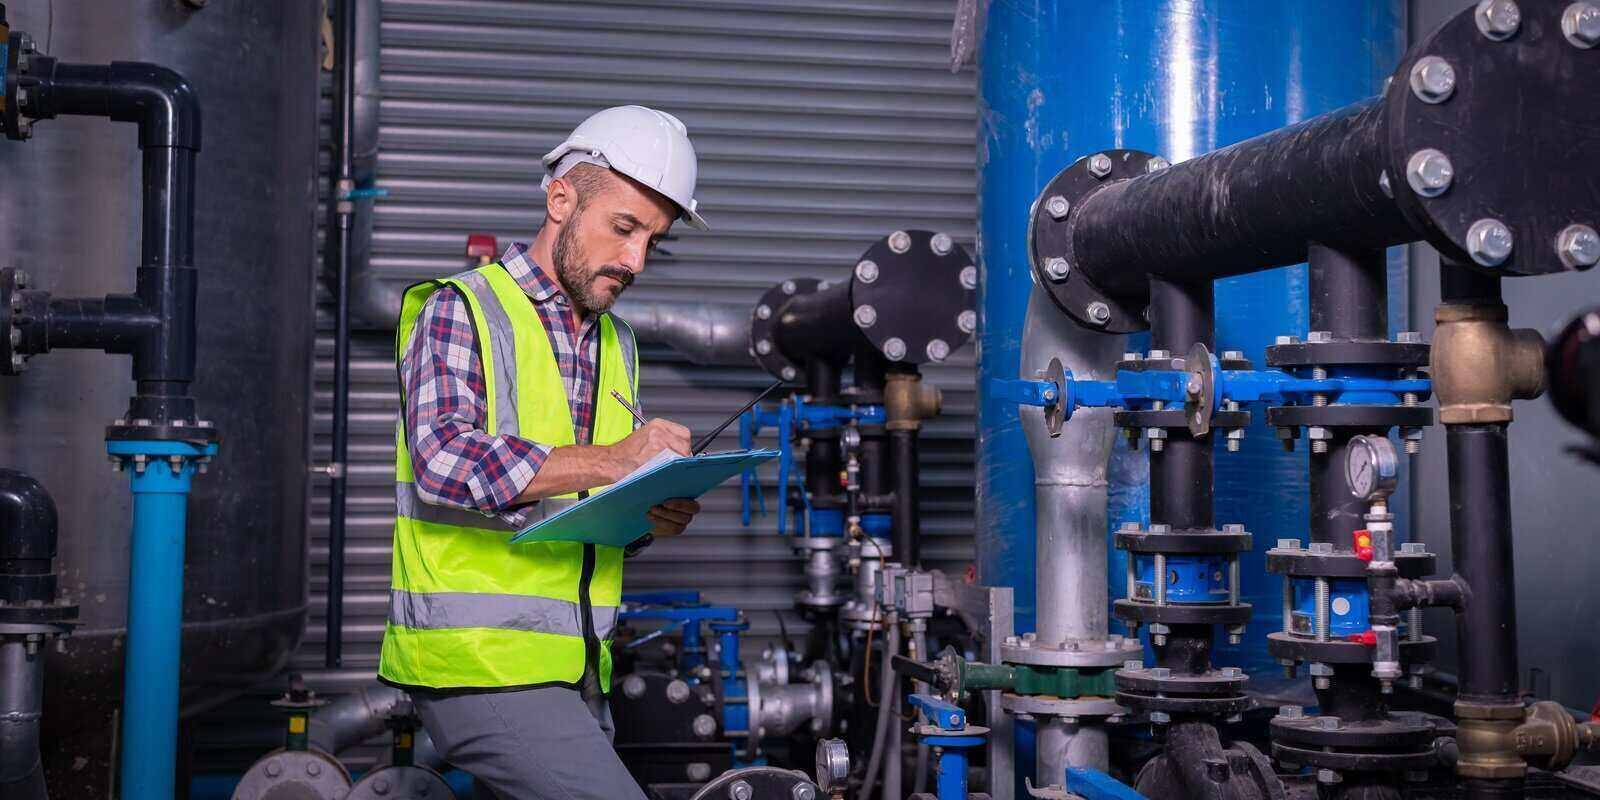 industry engineer worker wearing safety uniform